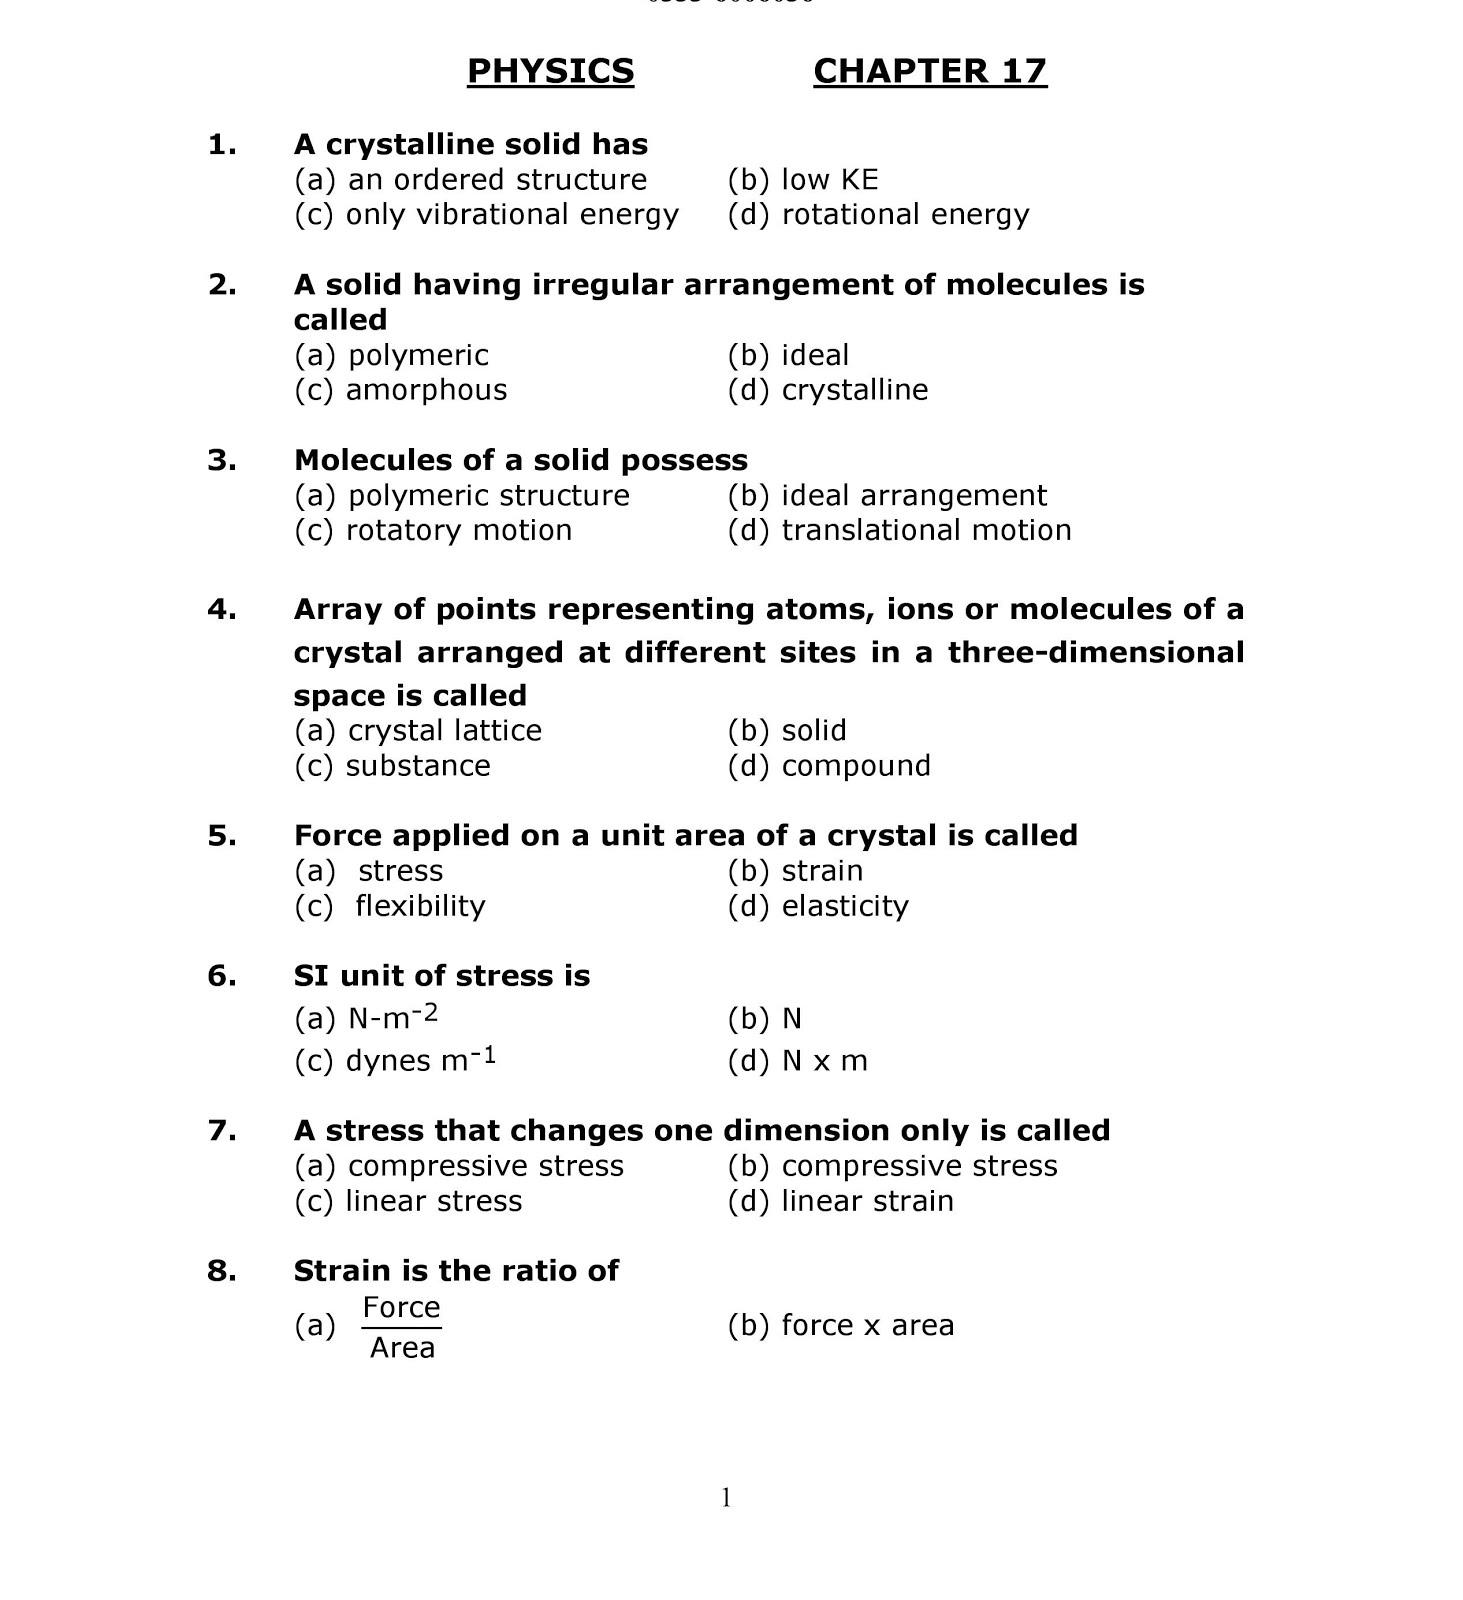 fsc physics mcqs with answers pdf